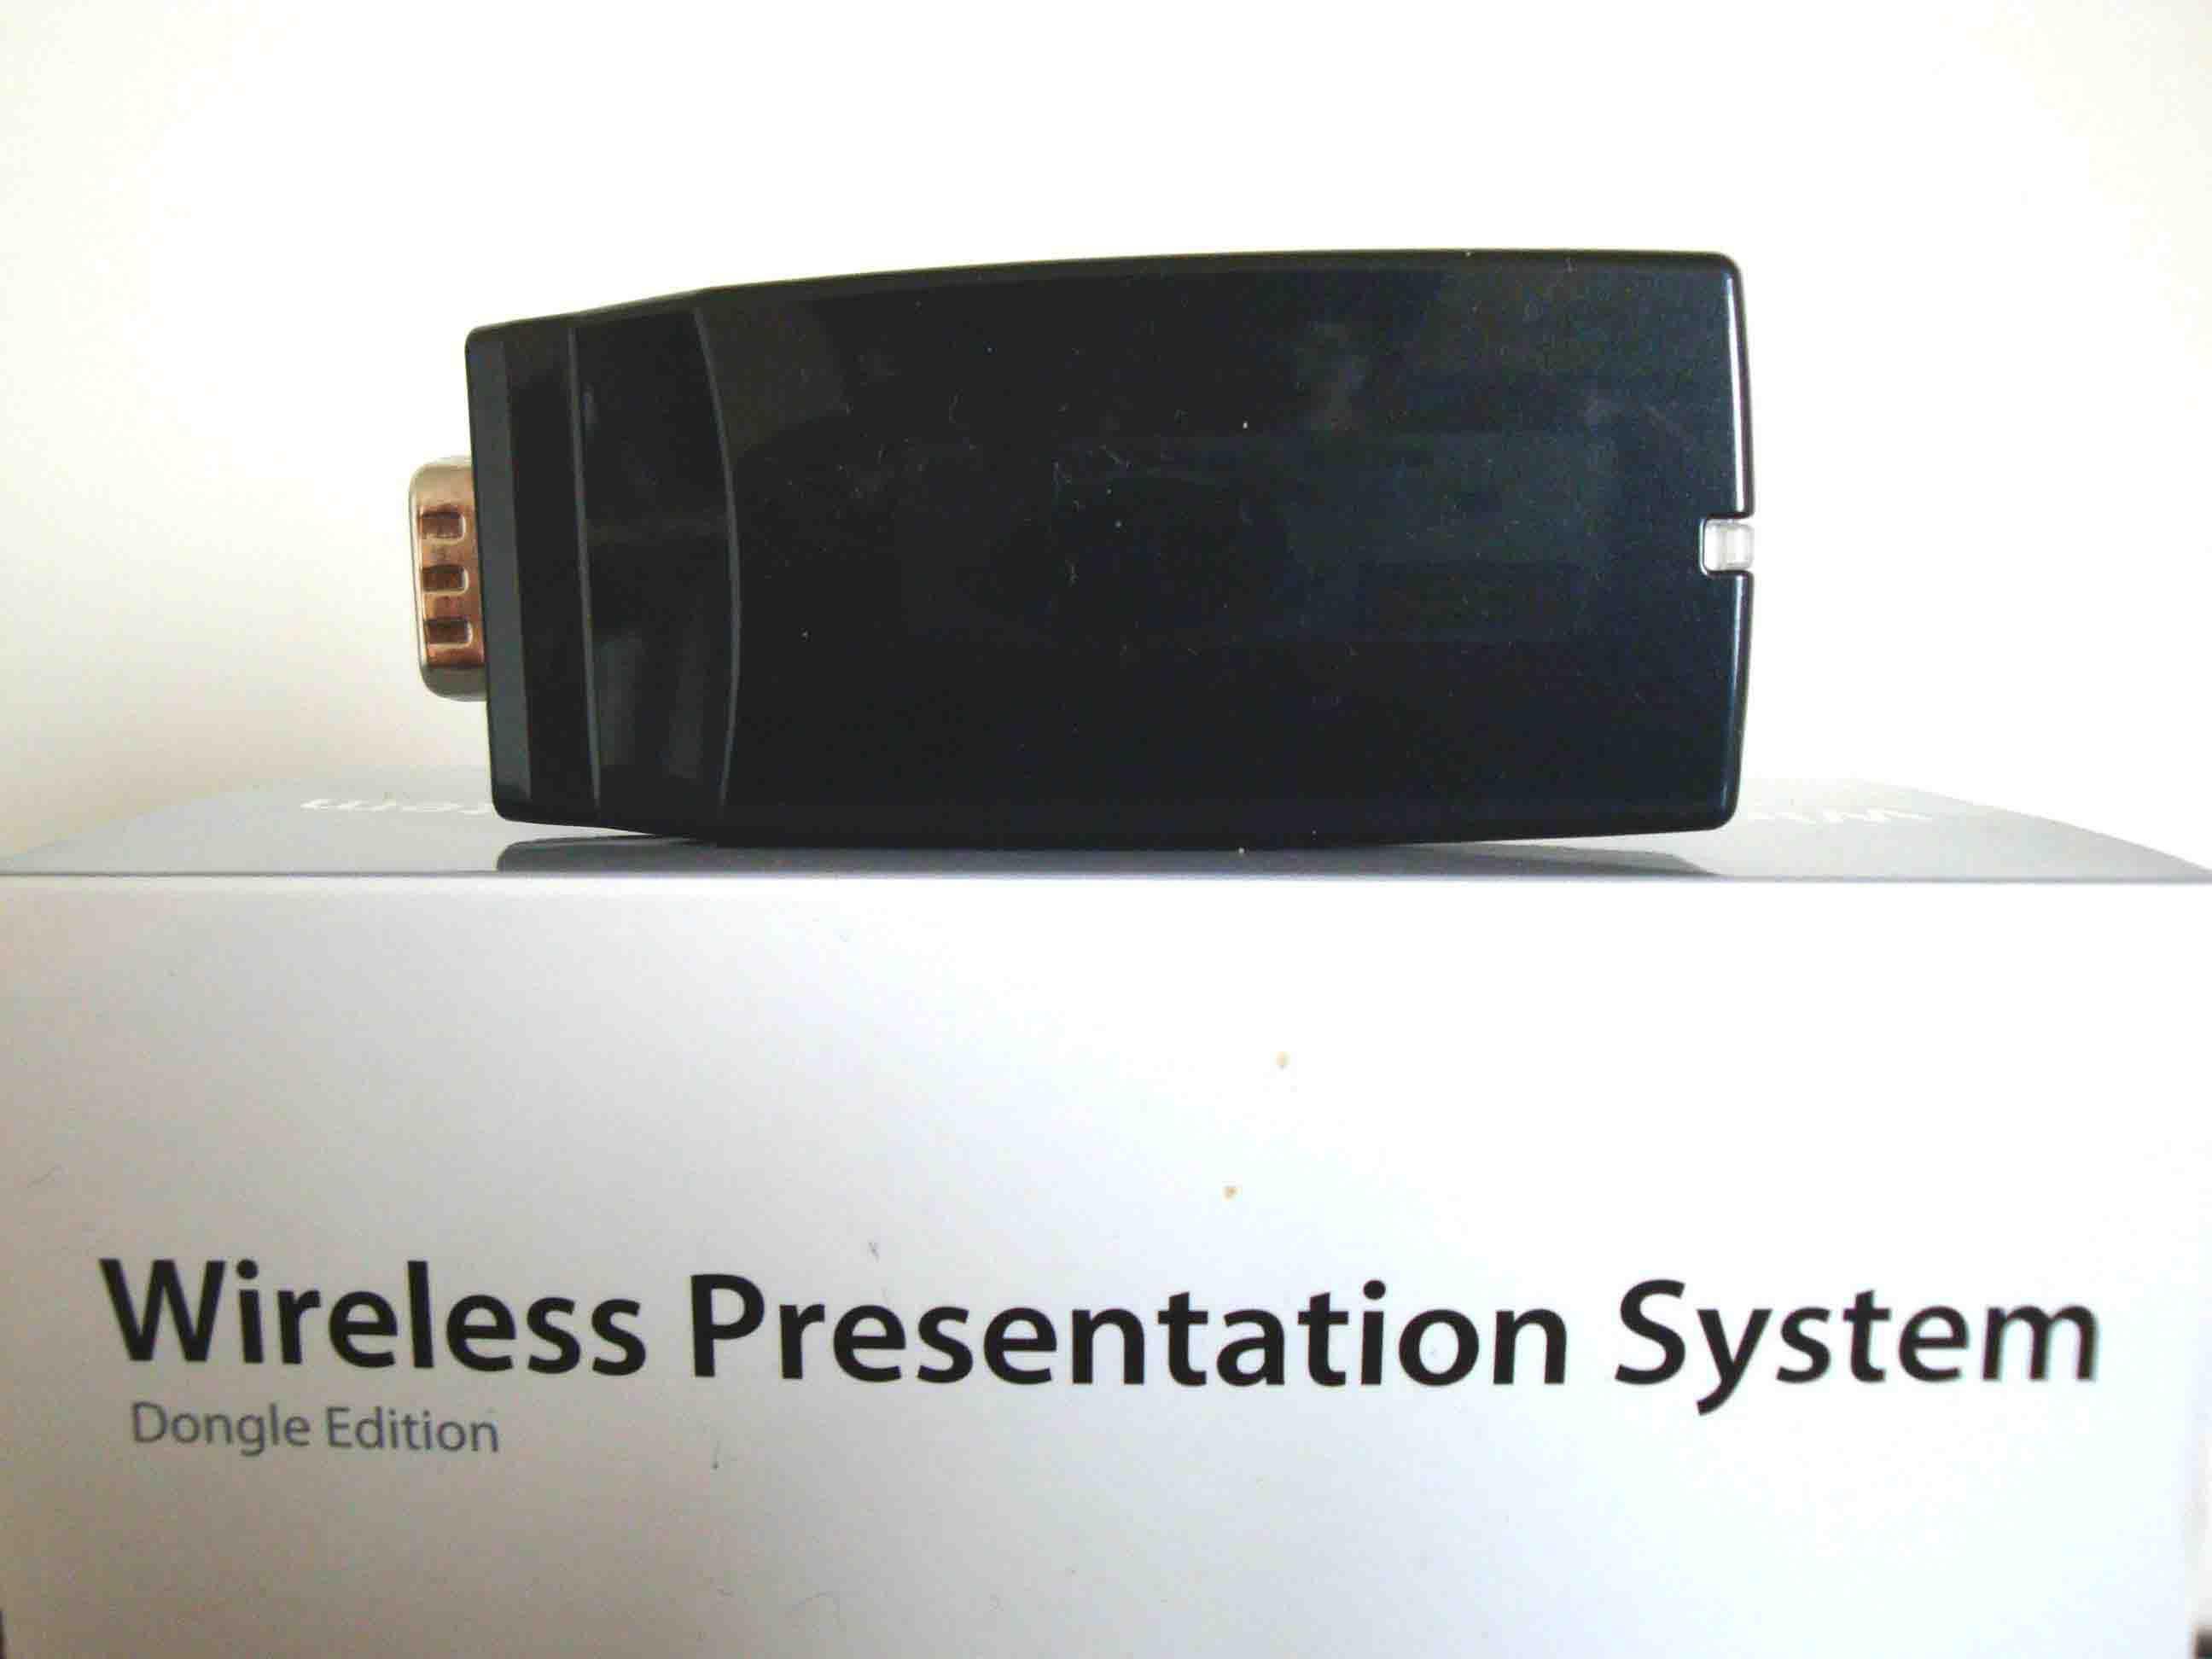 Wps Dongle Wireless Presentation Gateway Features